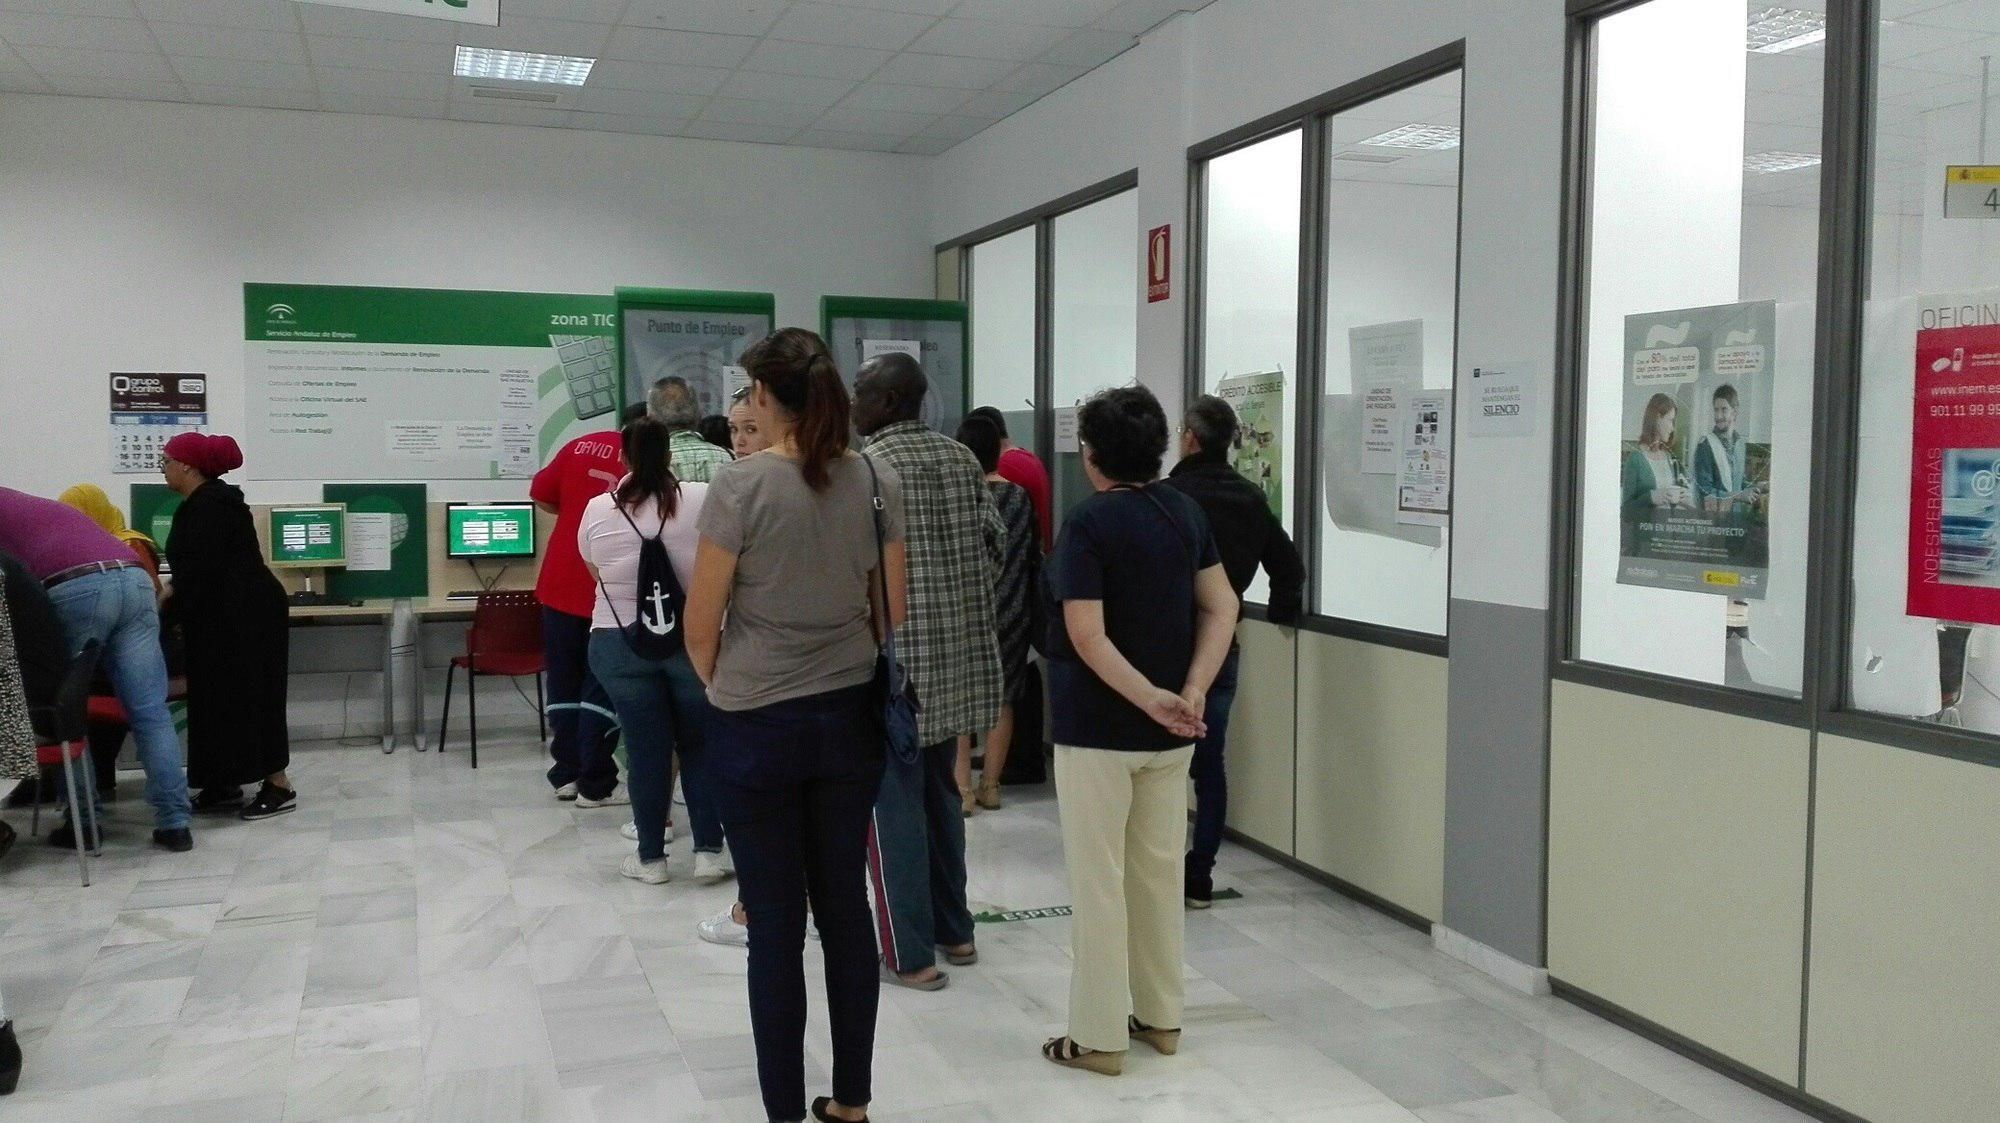 El sae de almer a recogi ofertas de empleo en 2017 for Oficina empleo almeria